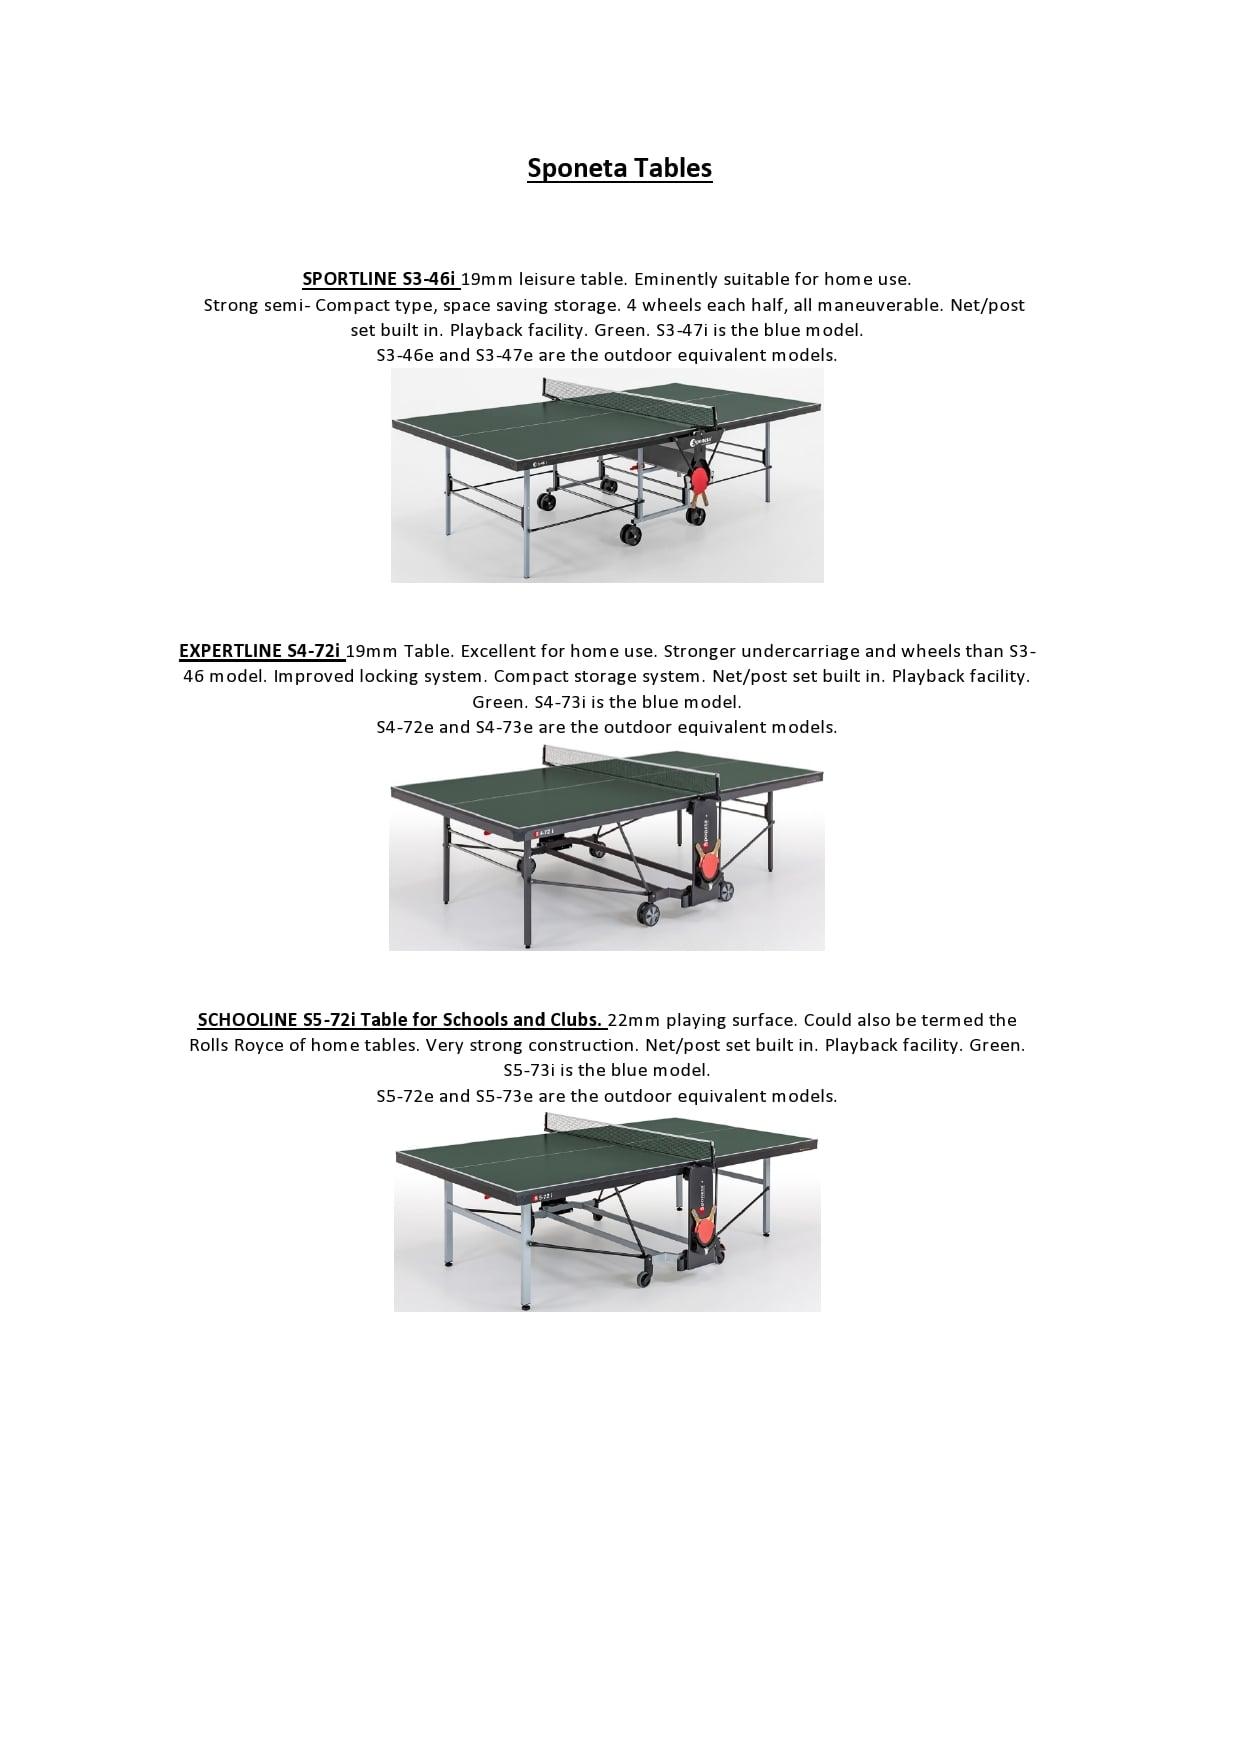 Sponeta Table Sales